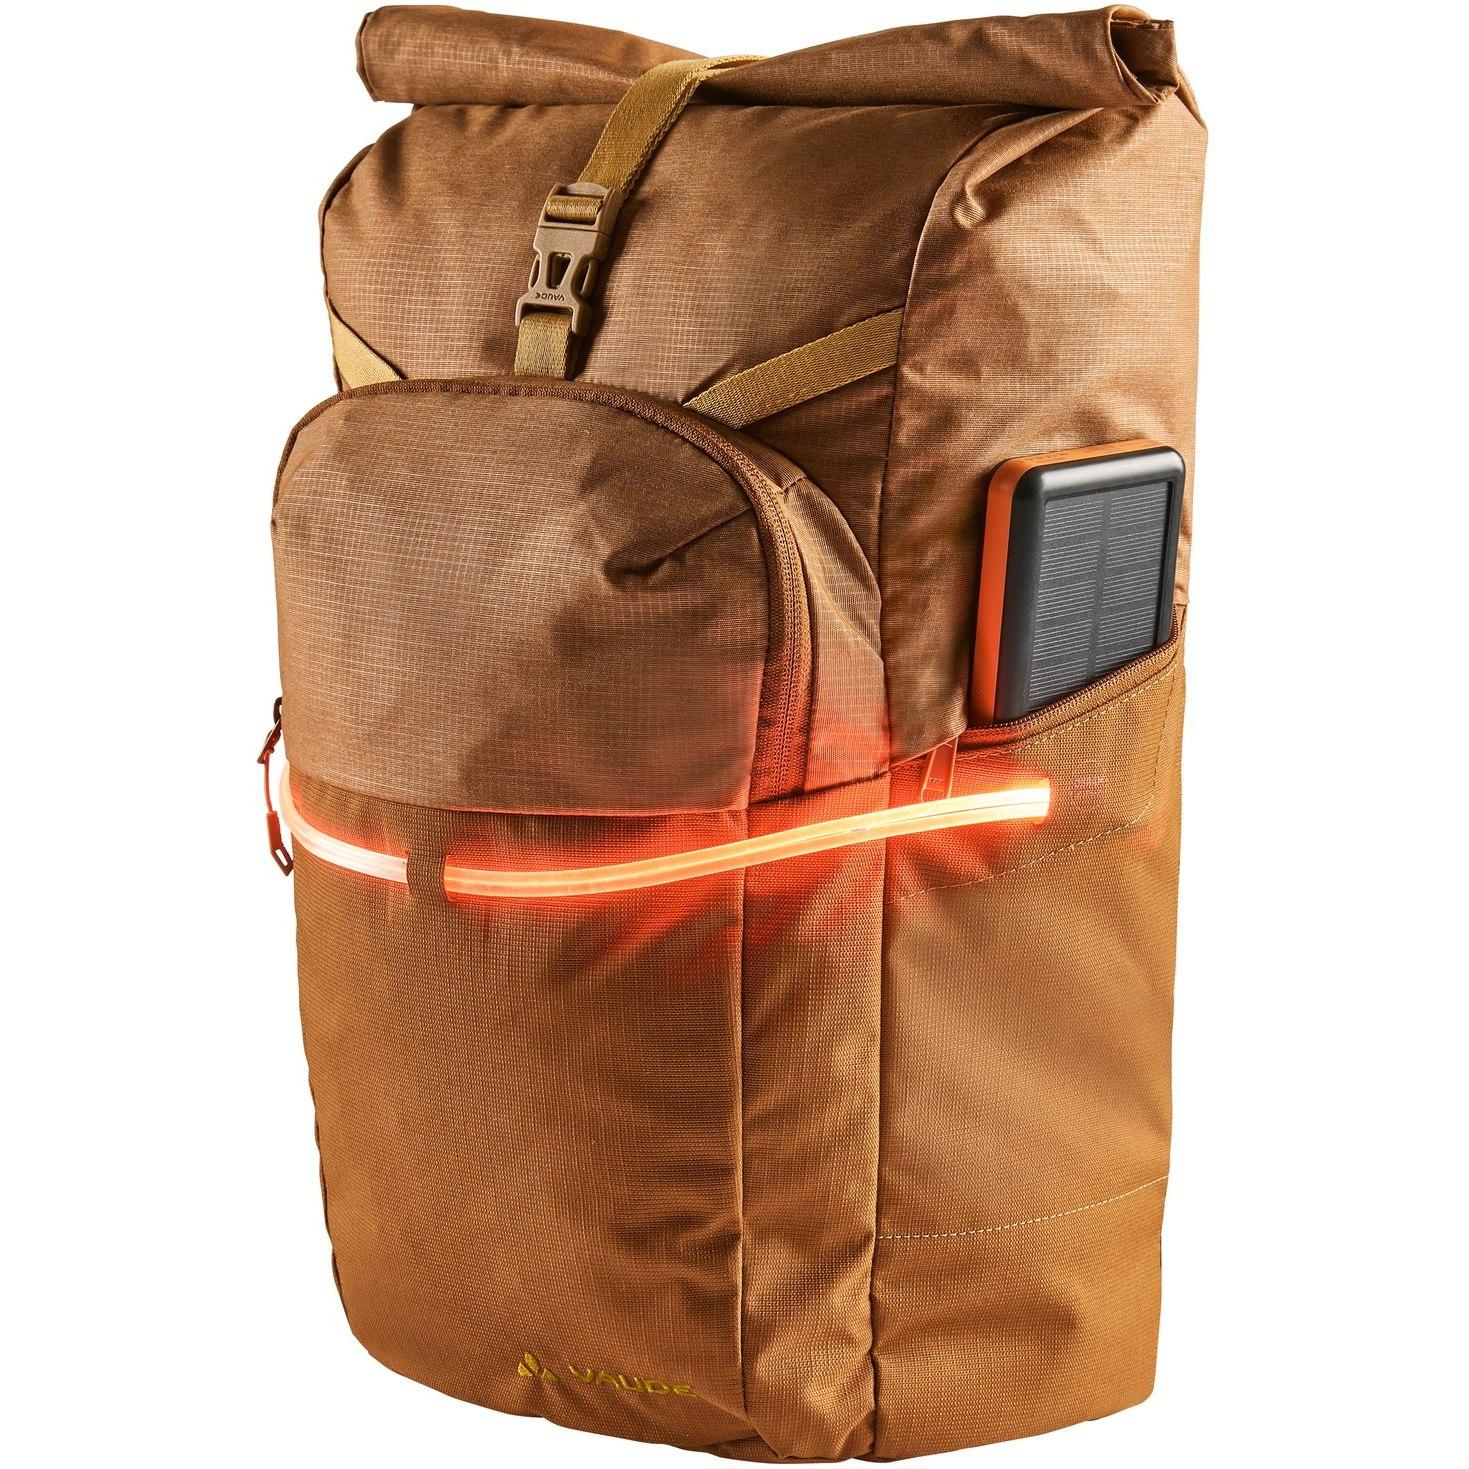 Image of Vaude Okab Backpack - chocolate